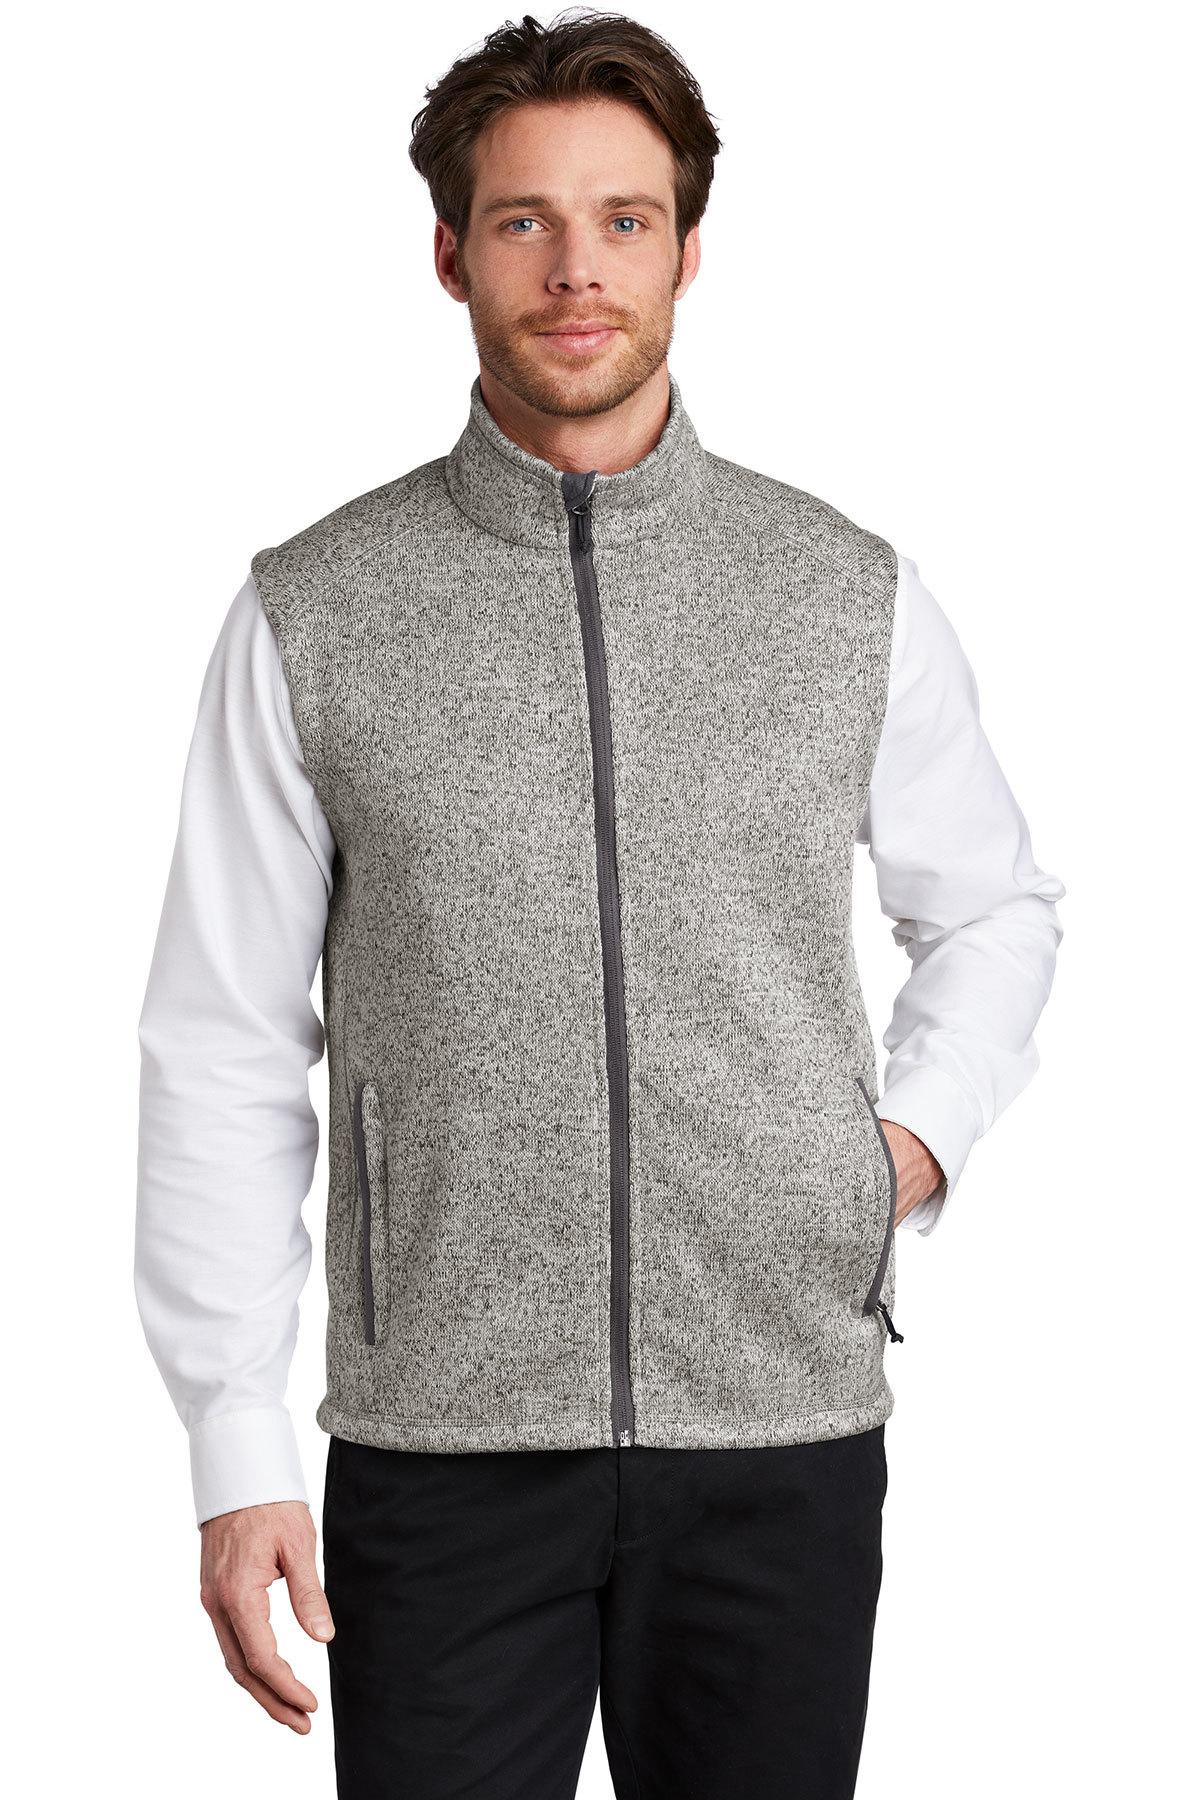 Port Authority F236 - Sweater Fleece Vest